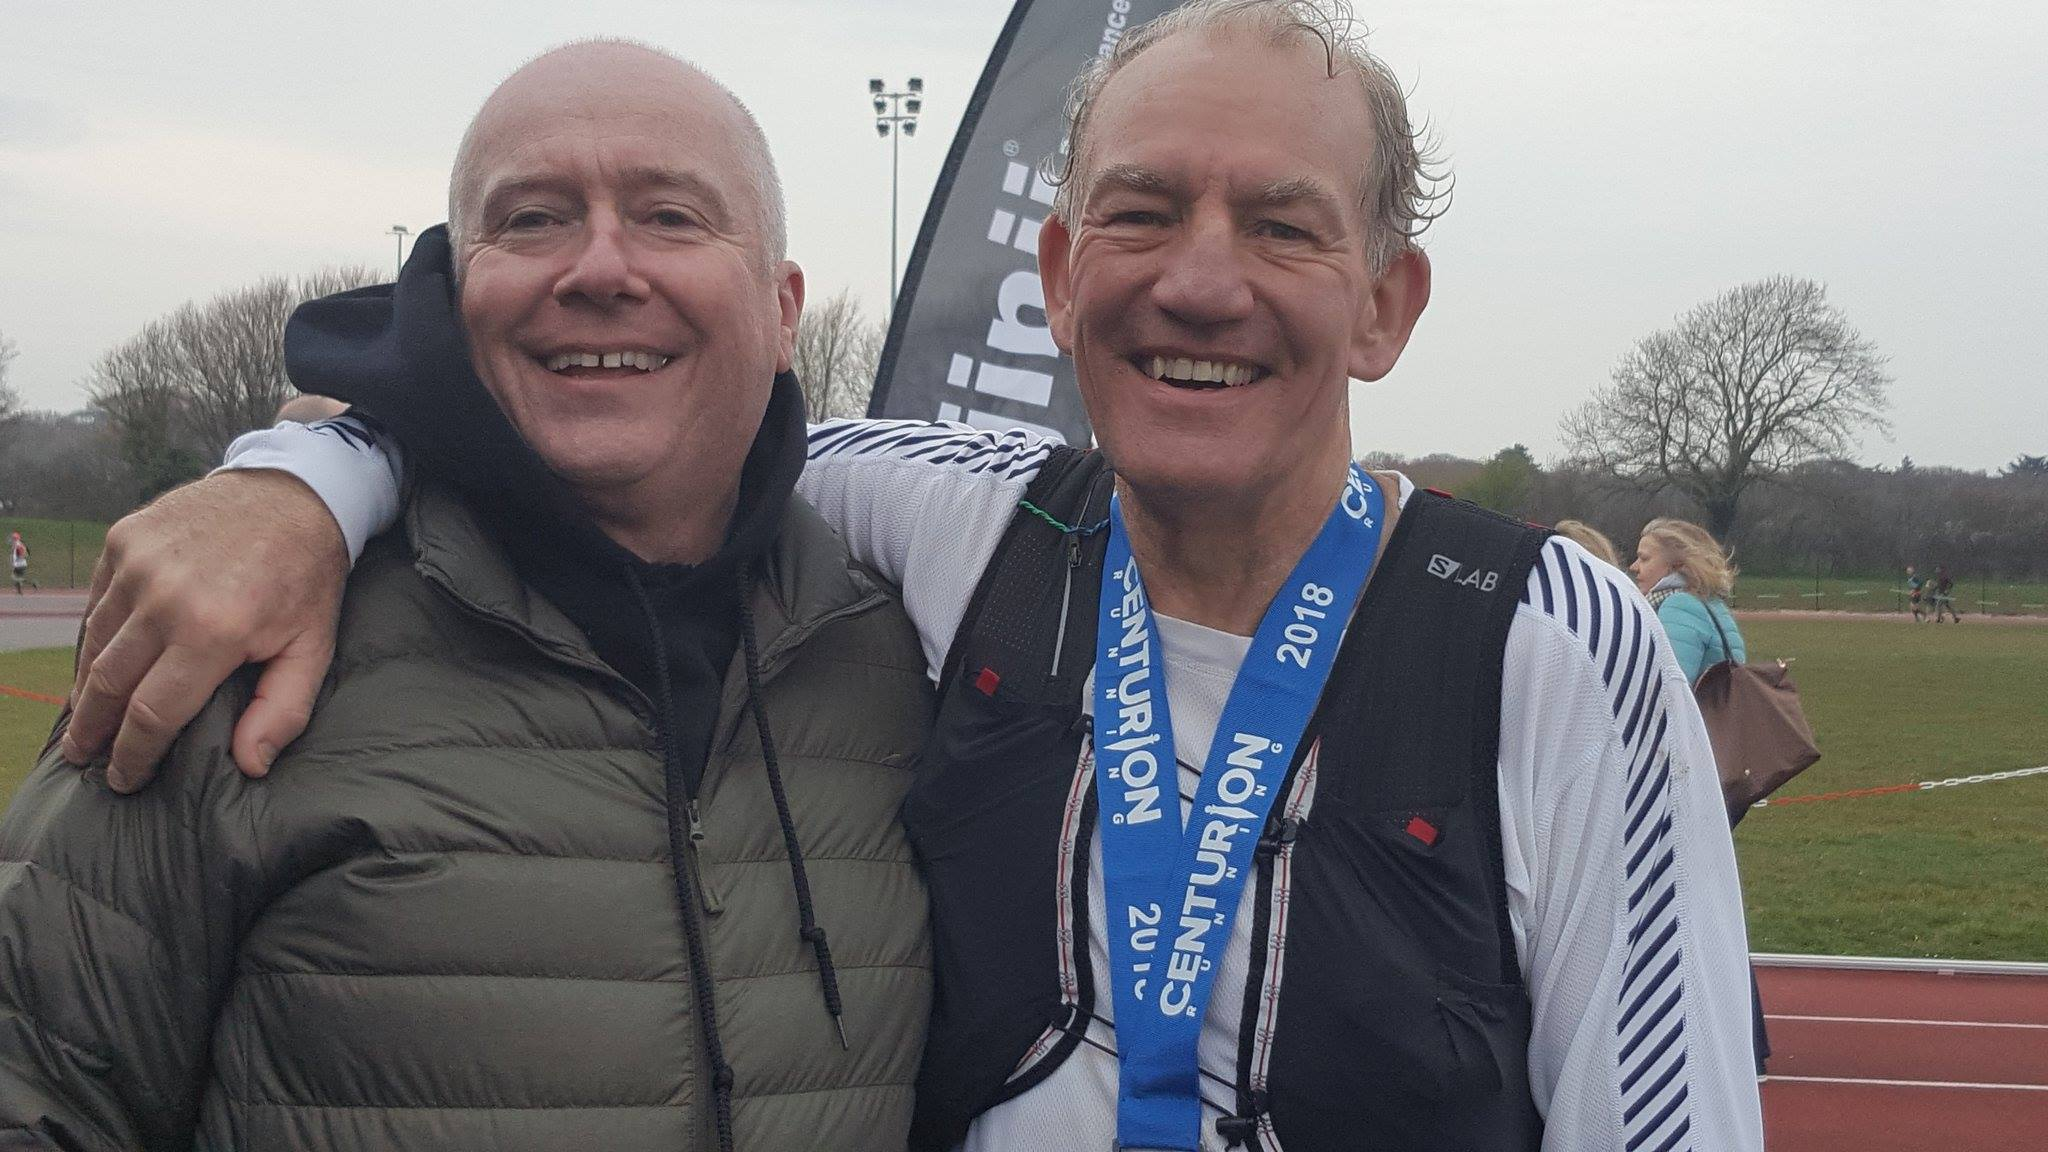 Neil Kirby Charity Run.jpg